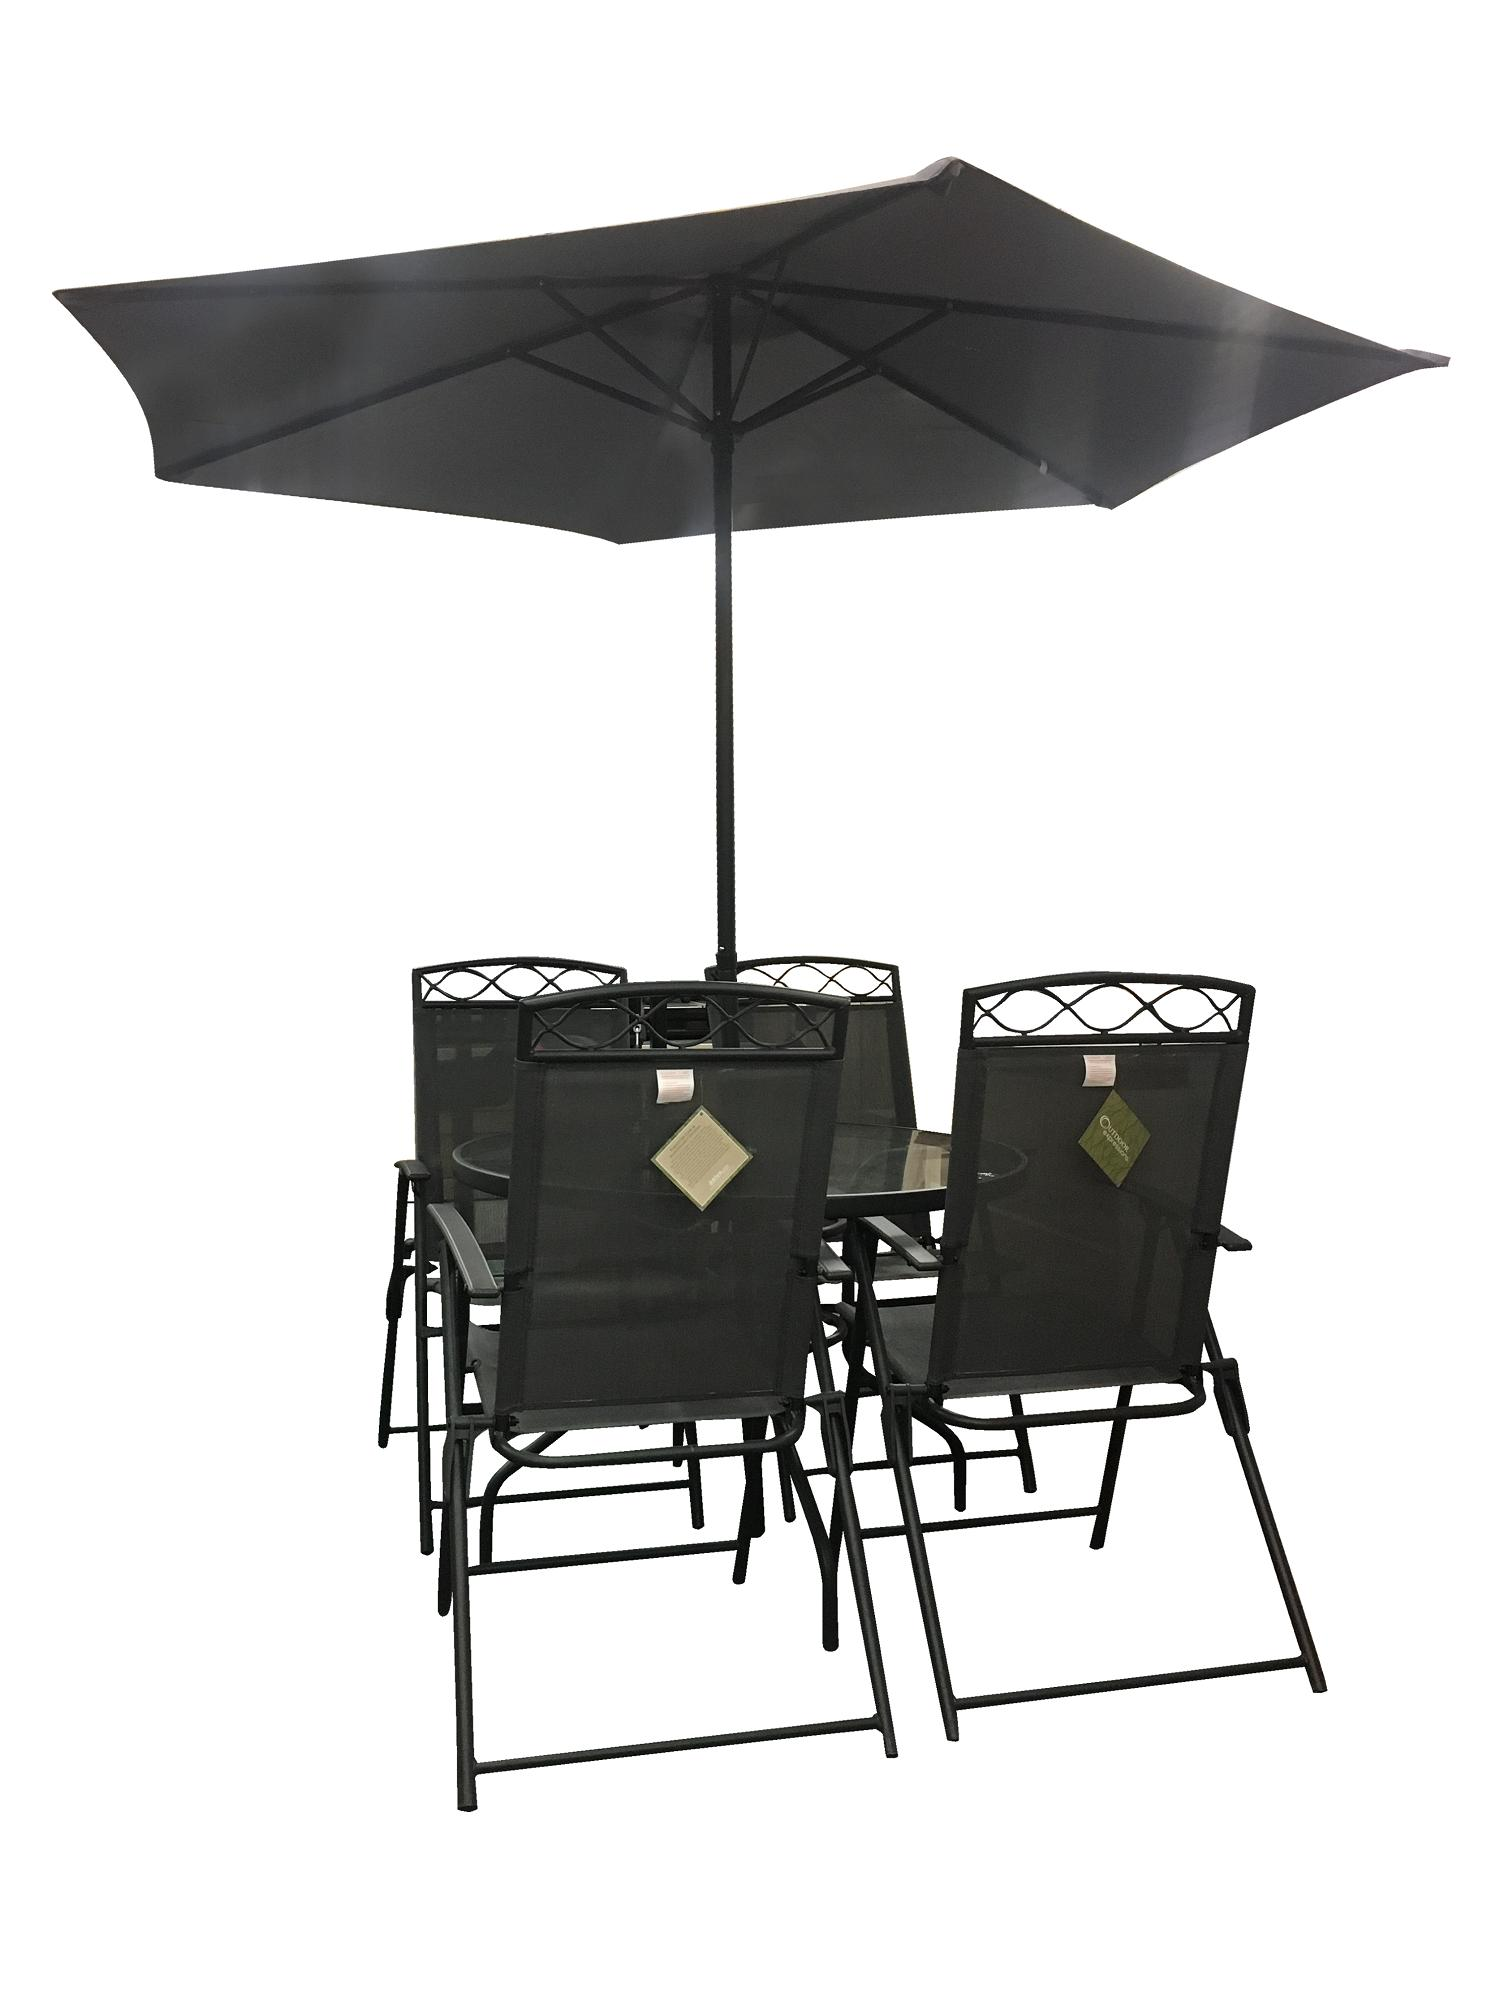 Do It Best Chair Table Umbrella Patio Set 6-Pc. Black By Handyman.